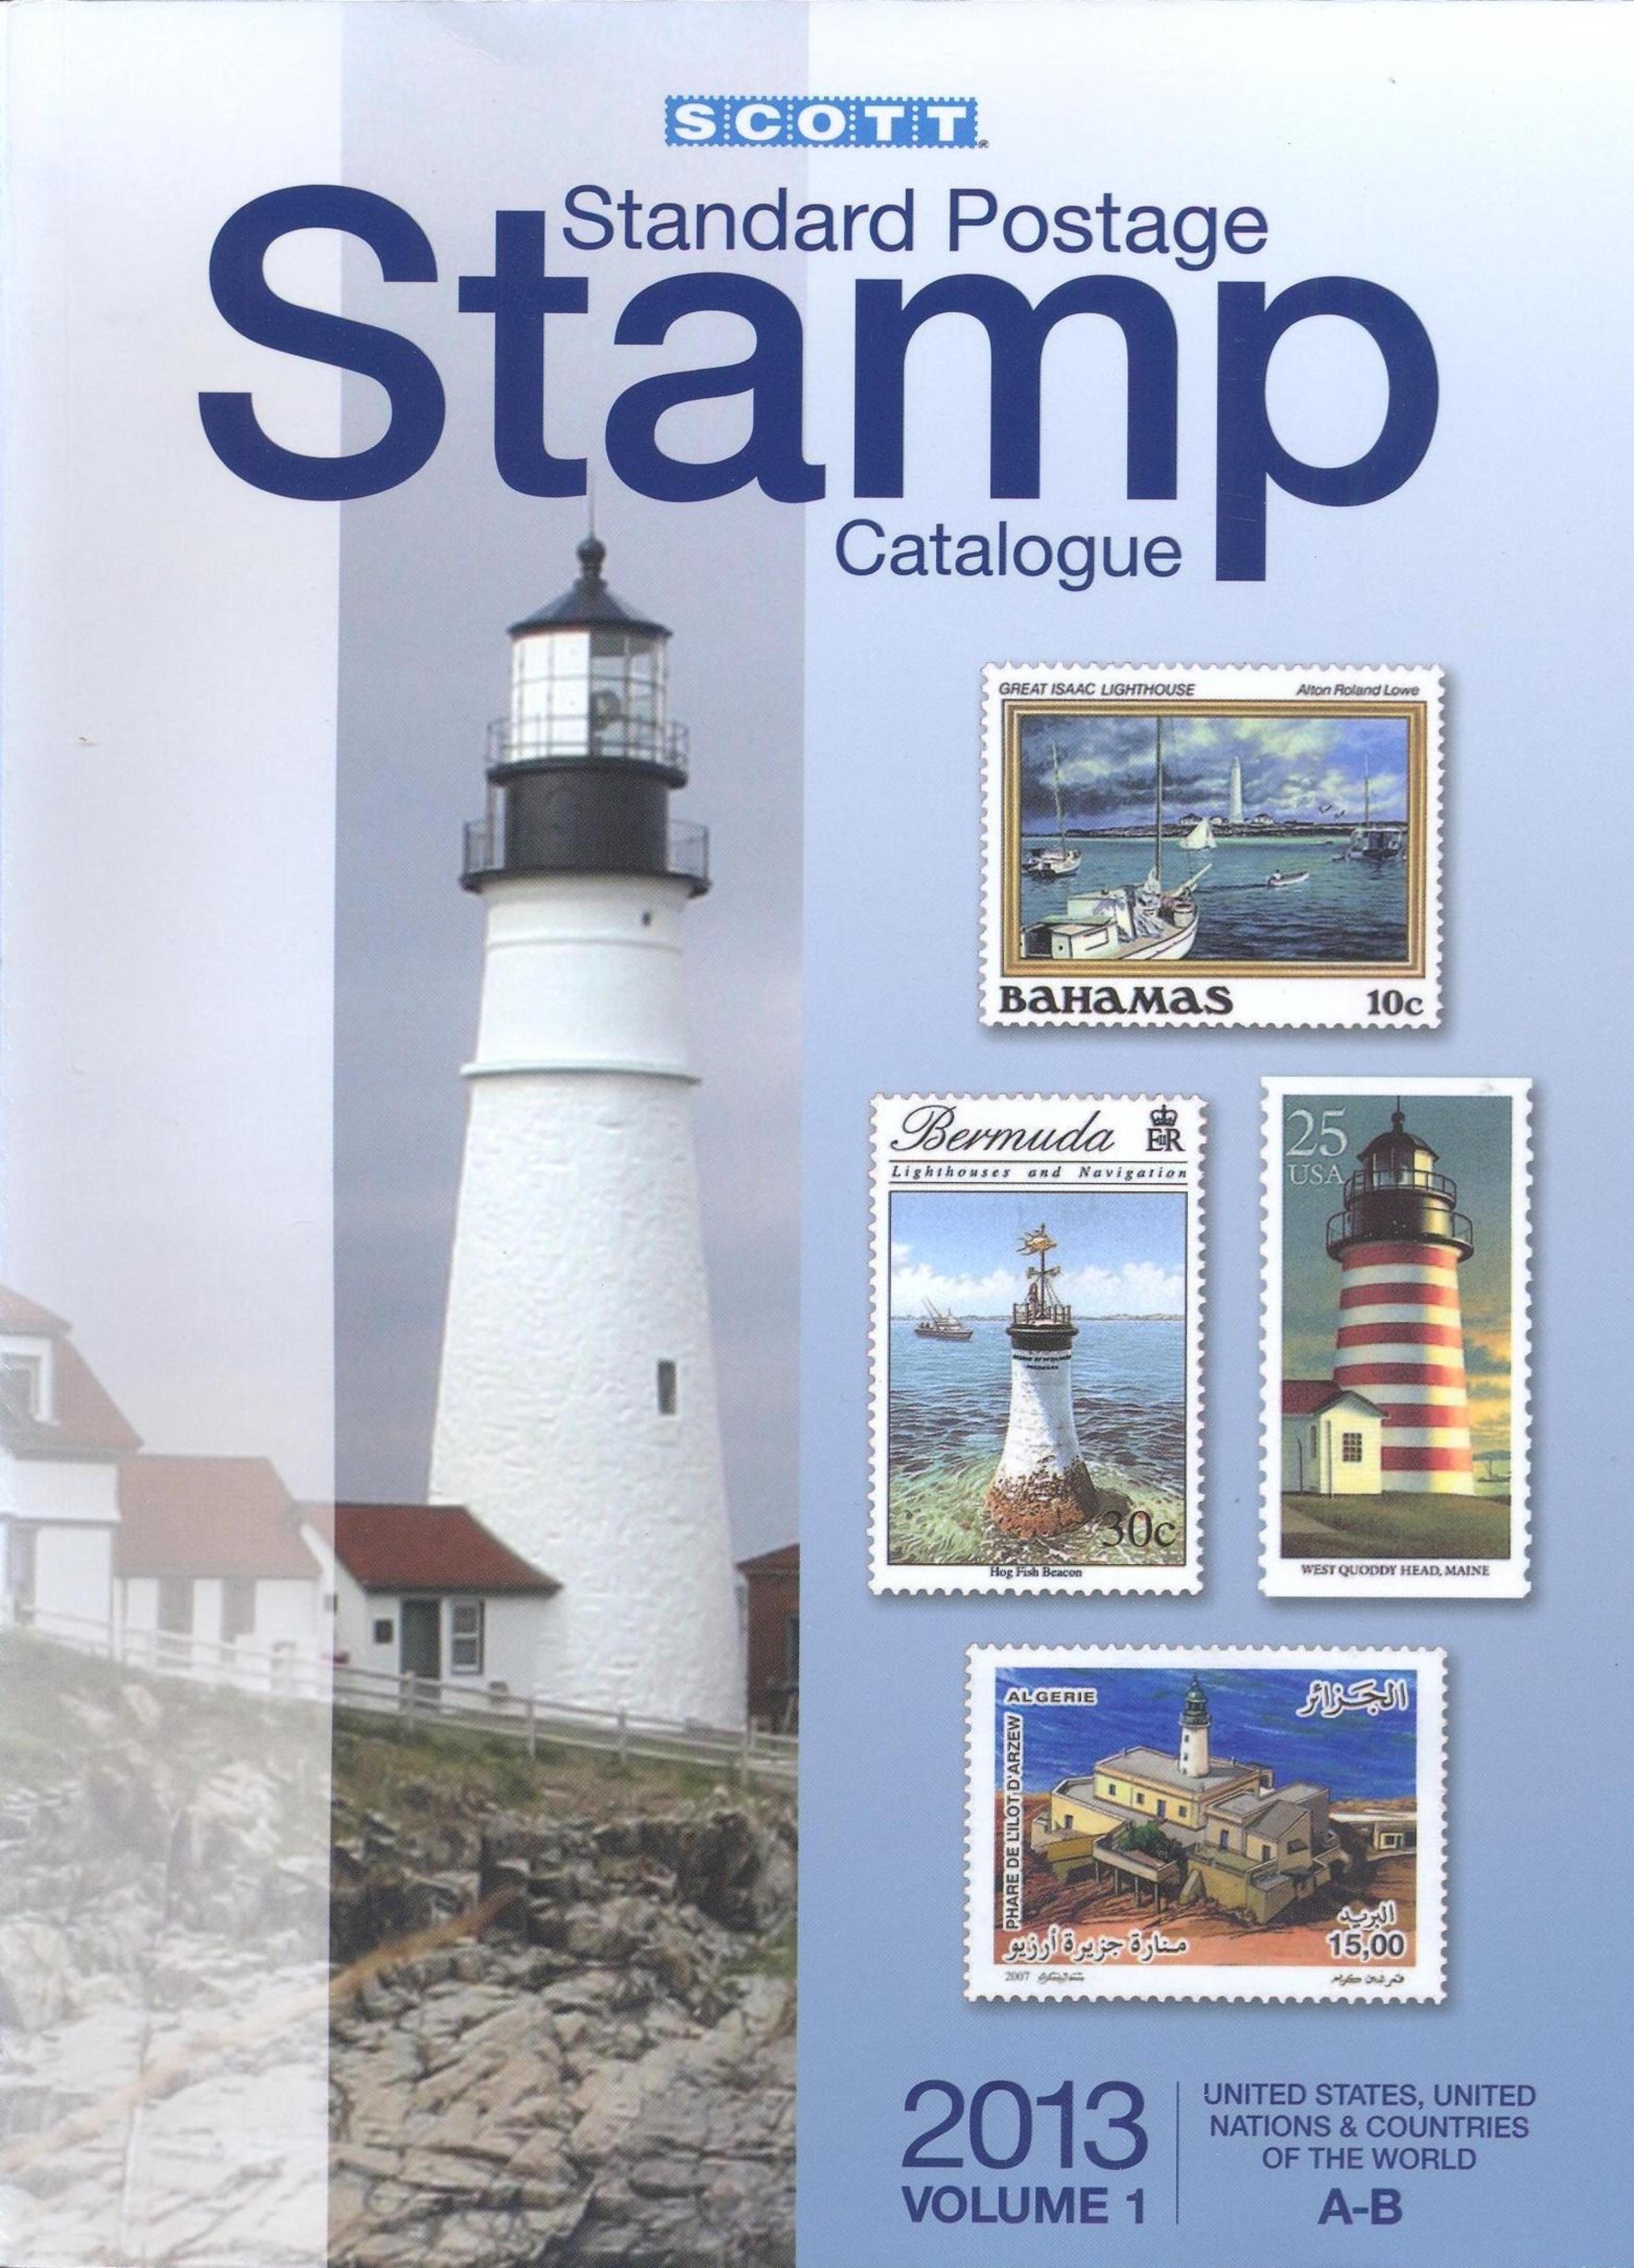 Scott Standard Postage Stamp Catalogue Volume 1, 2013 edition